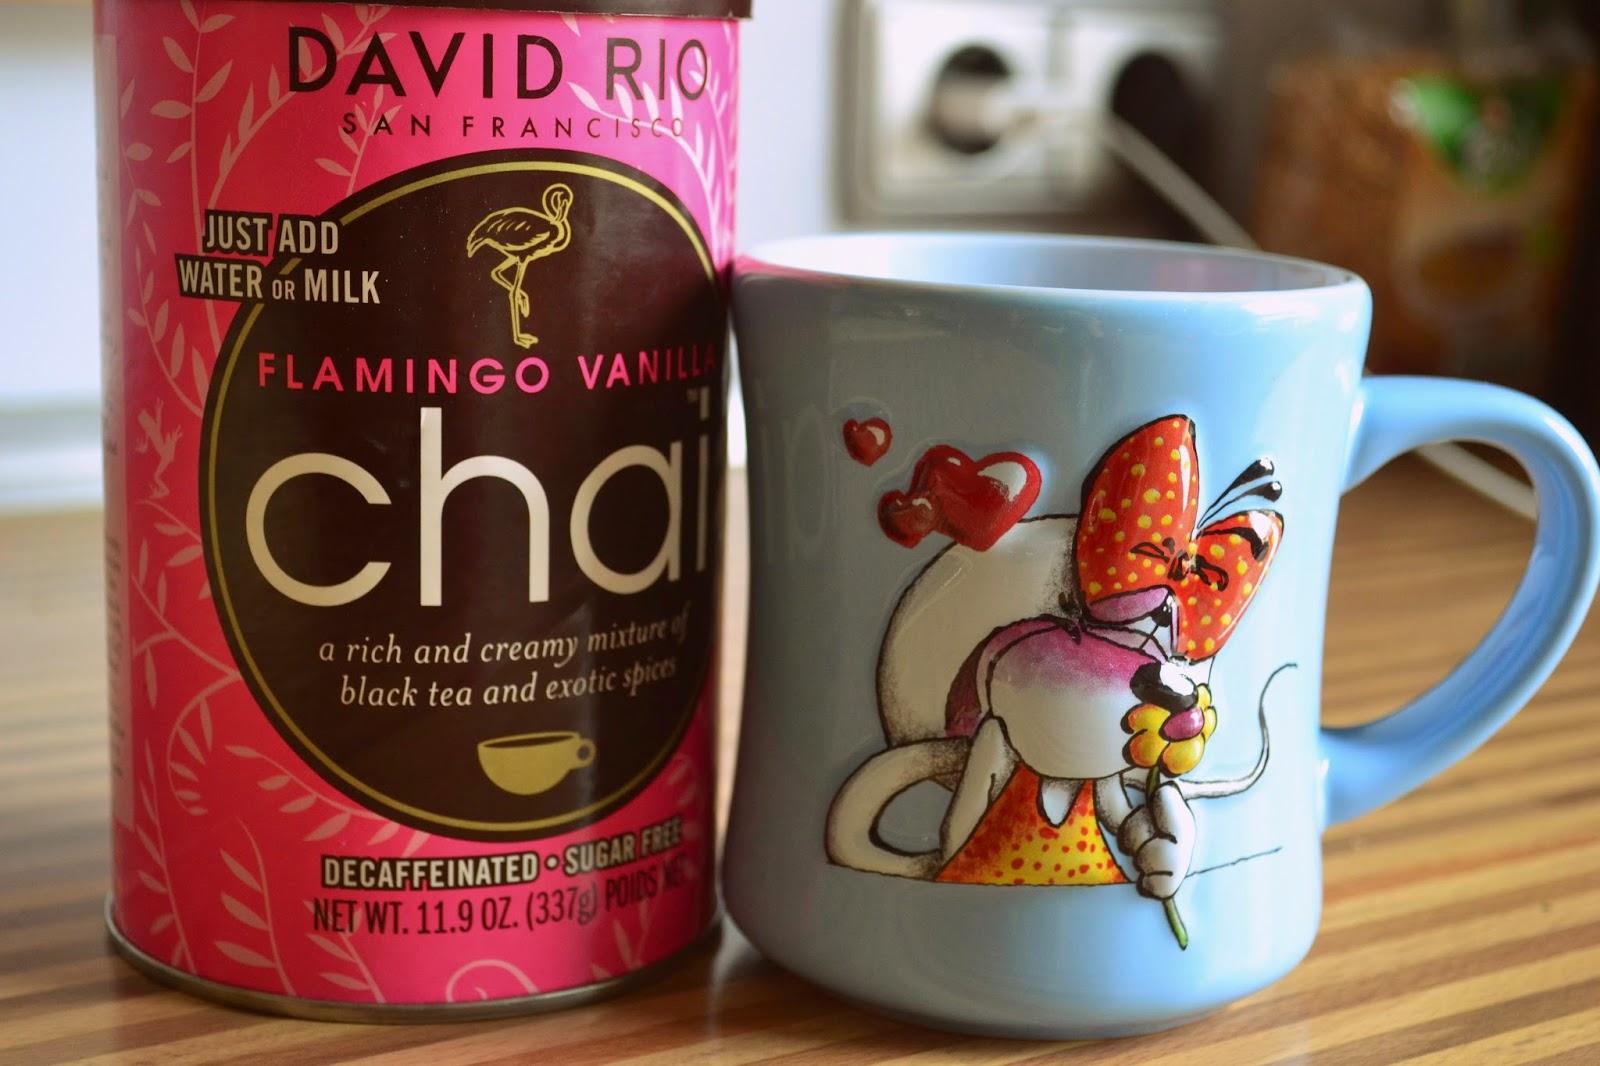 omg oatmeal ein neuer anfang vanille chai latte rezept. Black Bedroom Furniture Sets. Home Design Ideas